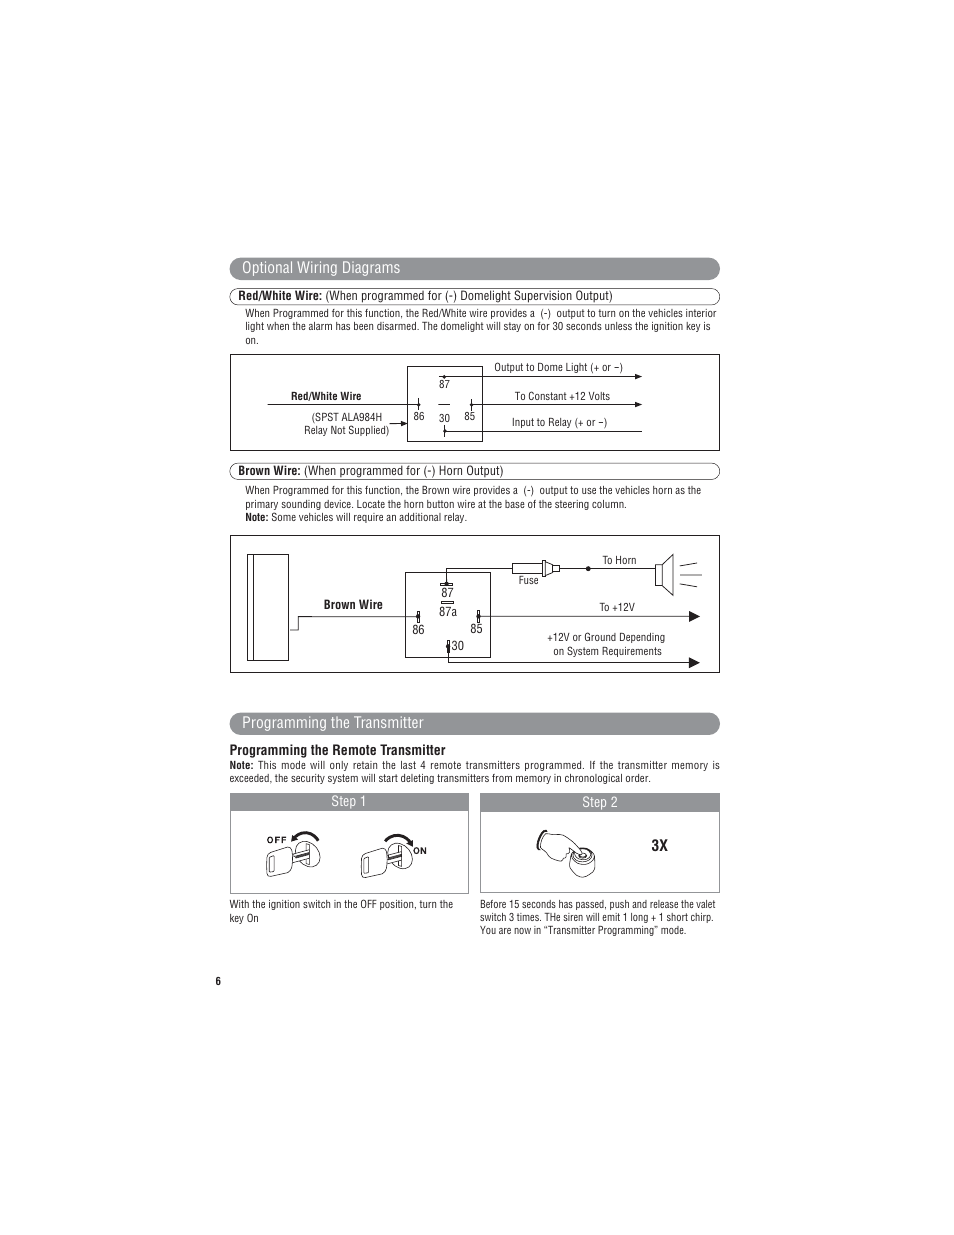 Marksman Series X3 User Manual   Page 6 / 12   Original mode